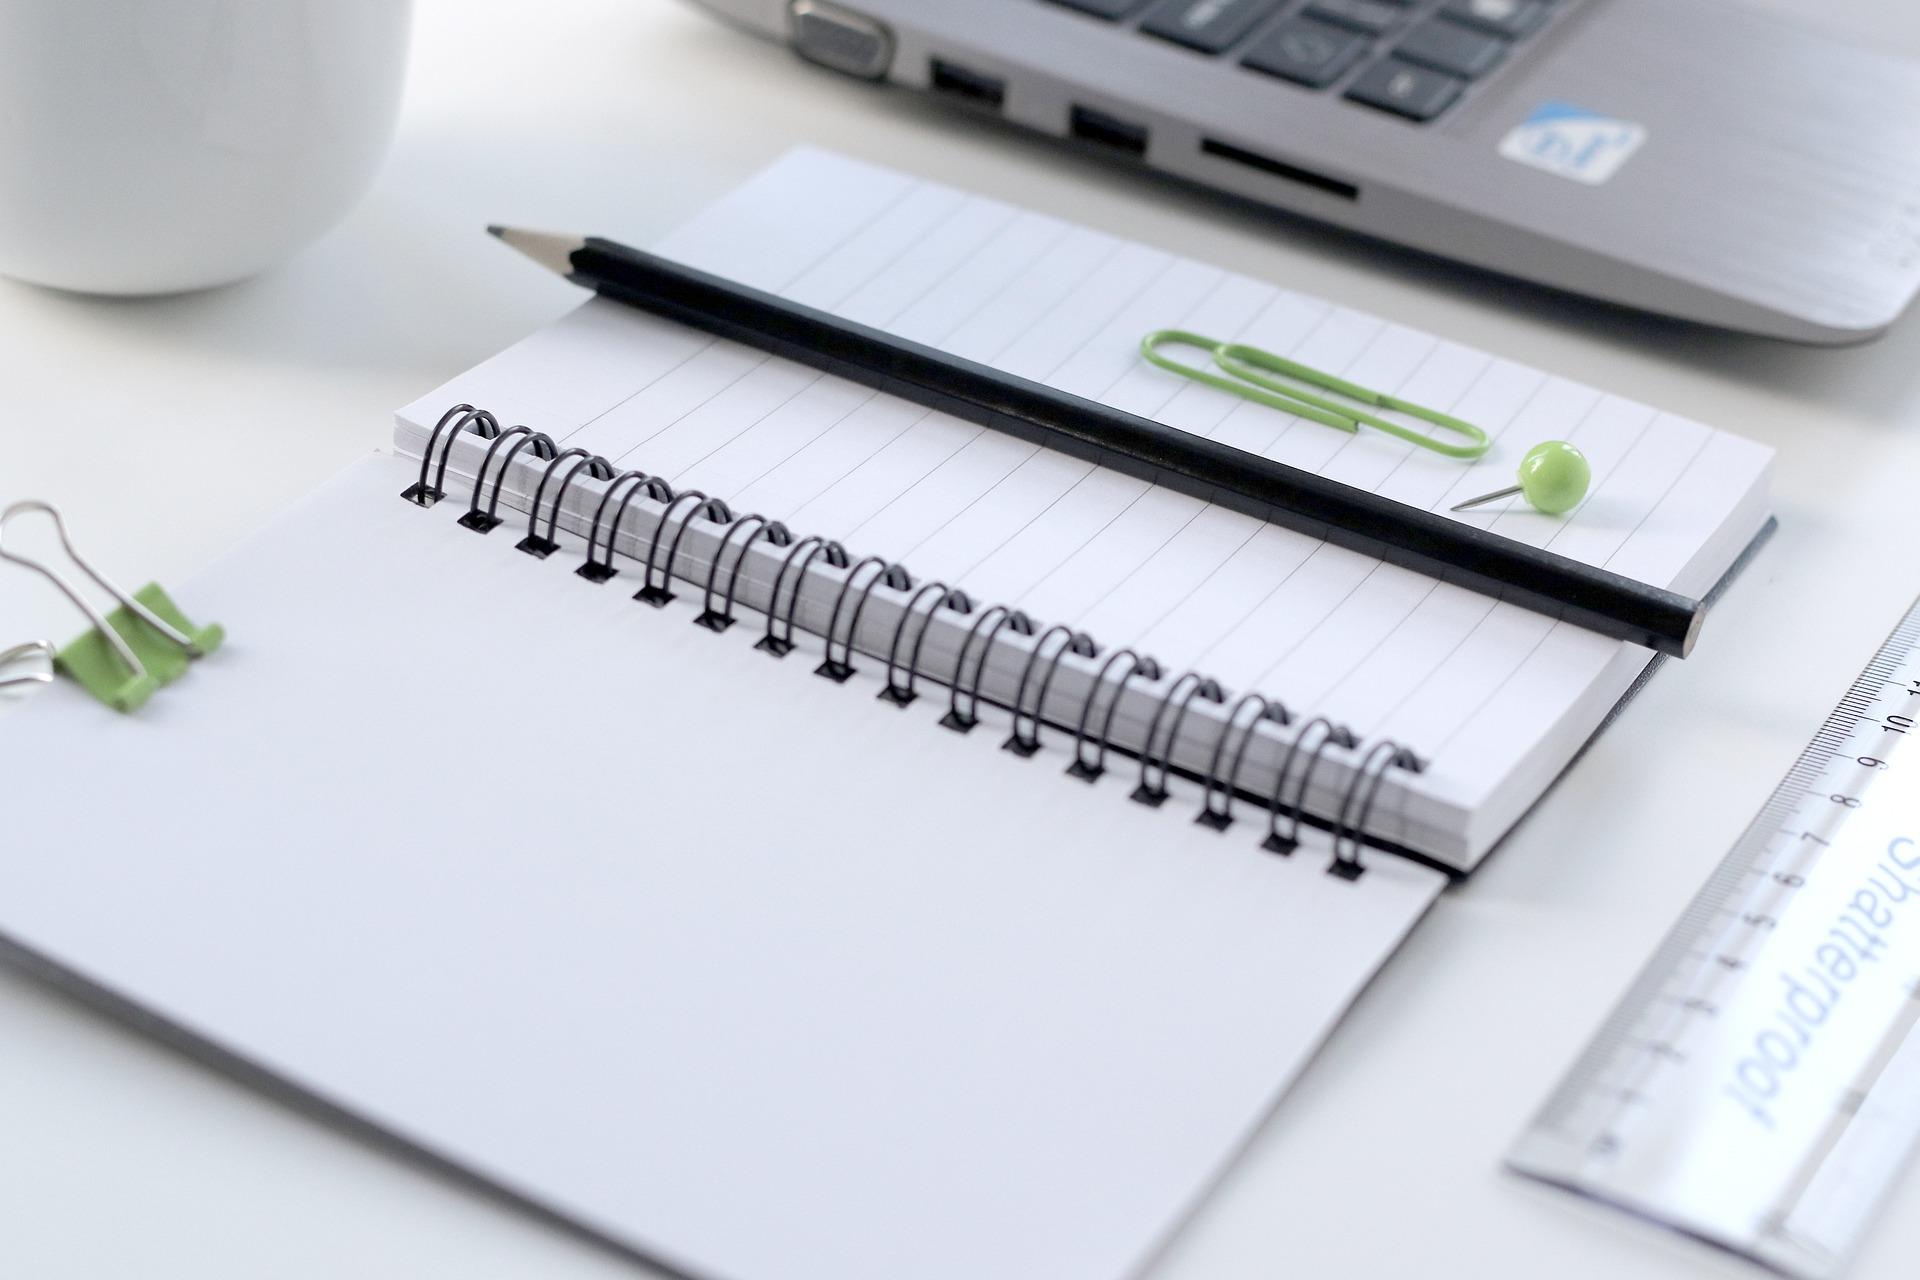 Изготвяне на бизнес план